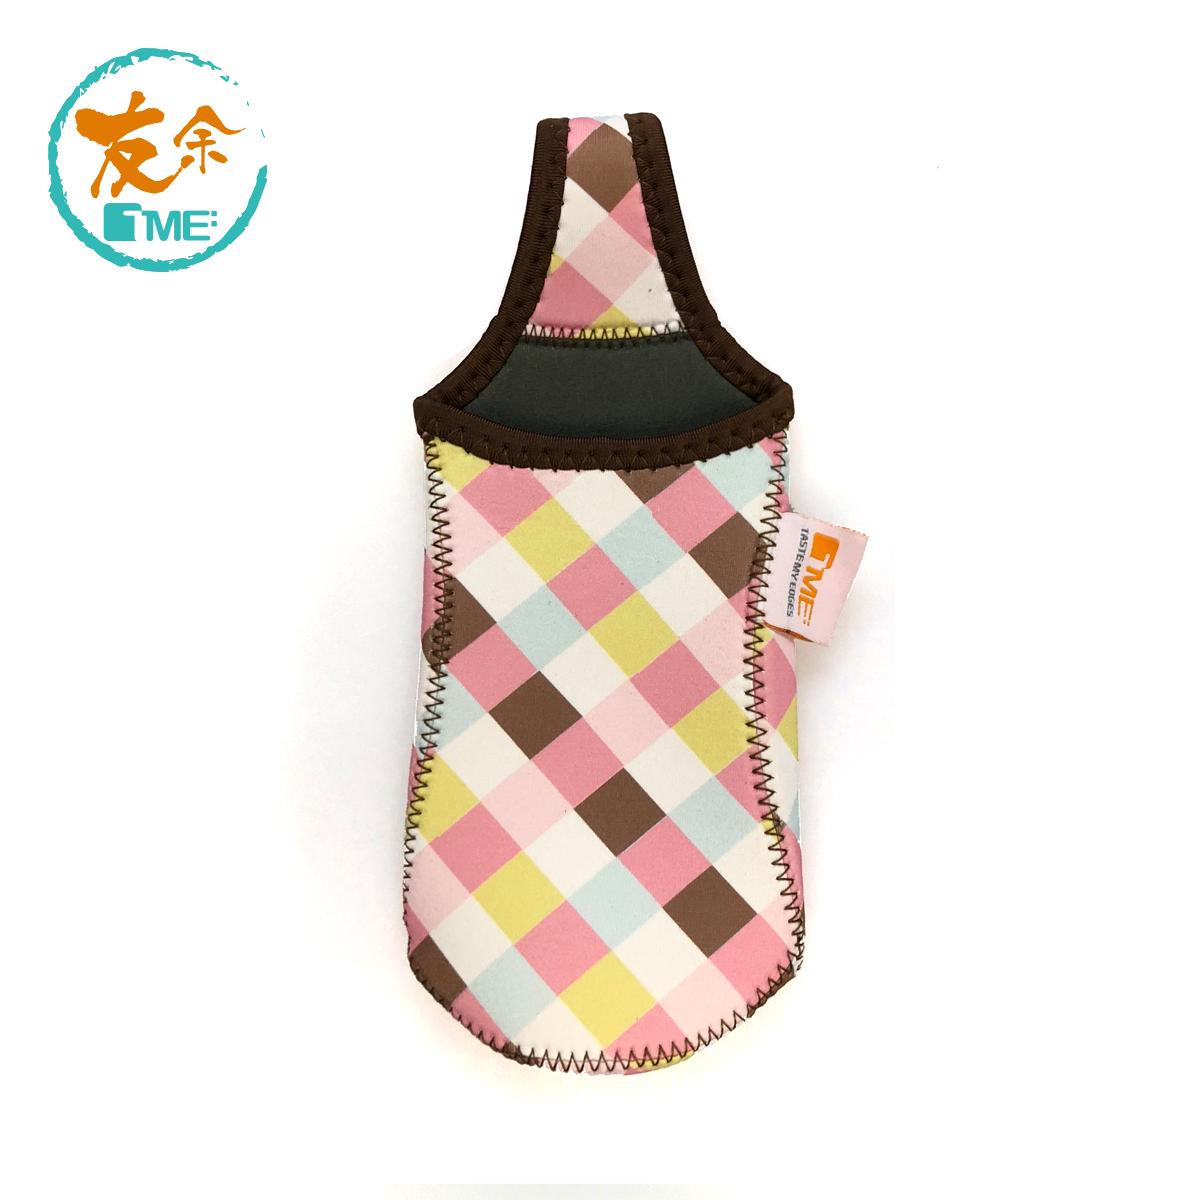 Portable Bottle Cover - Plaid/Pink